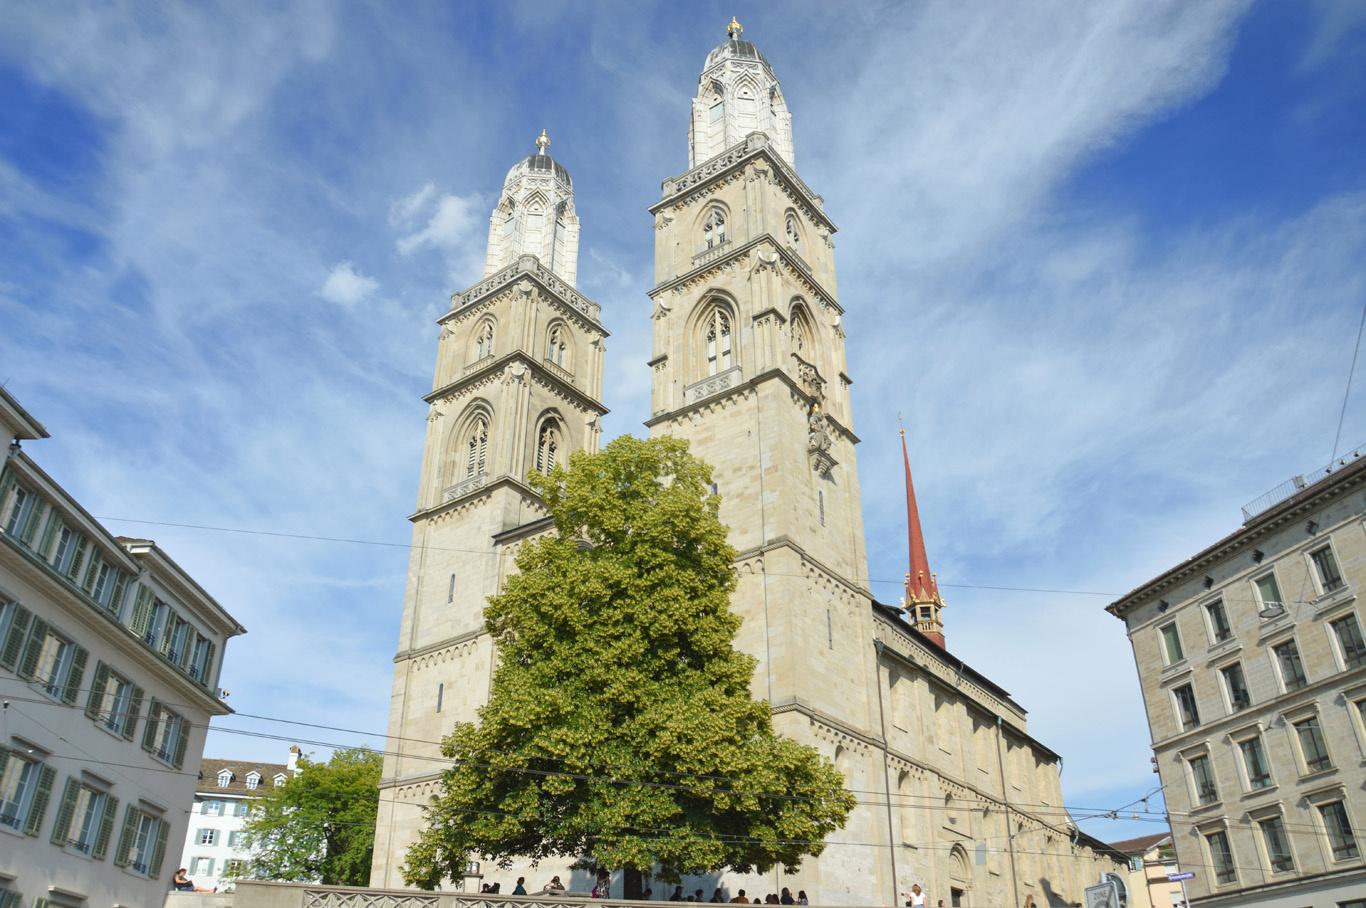 Grossmunster Church